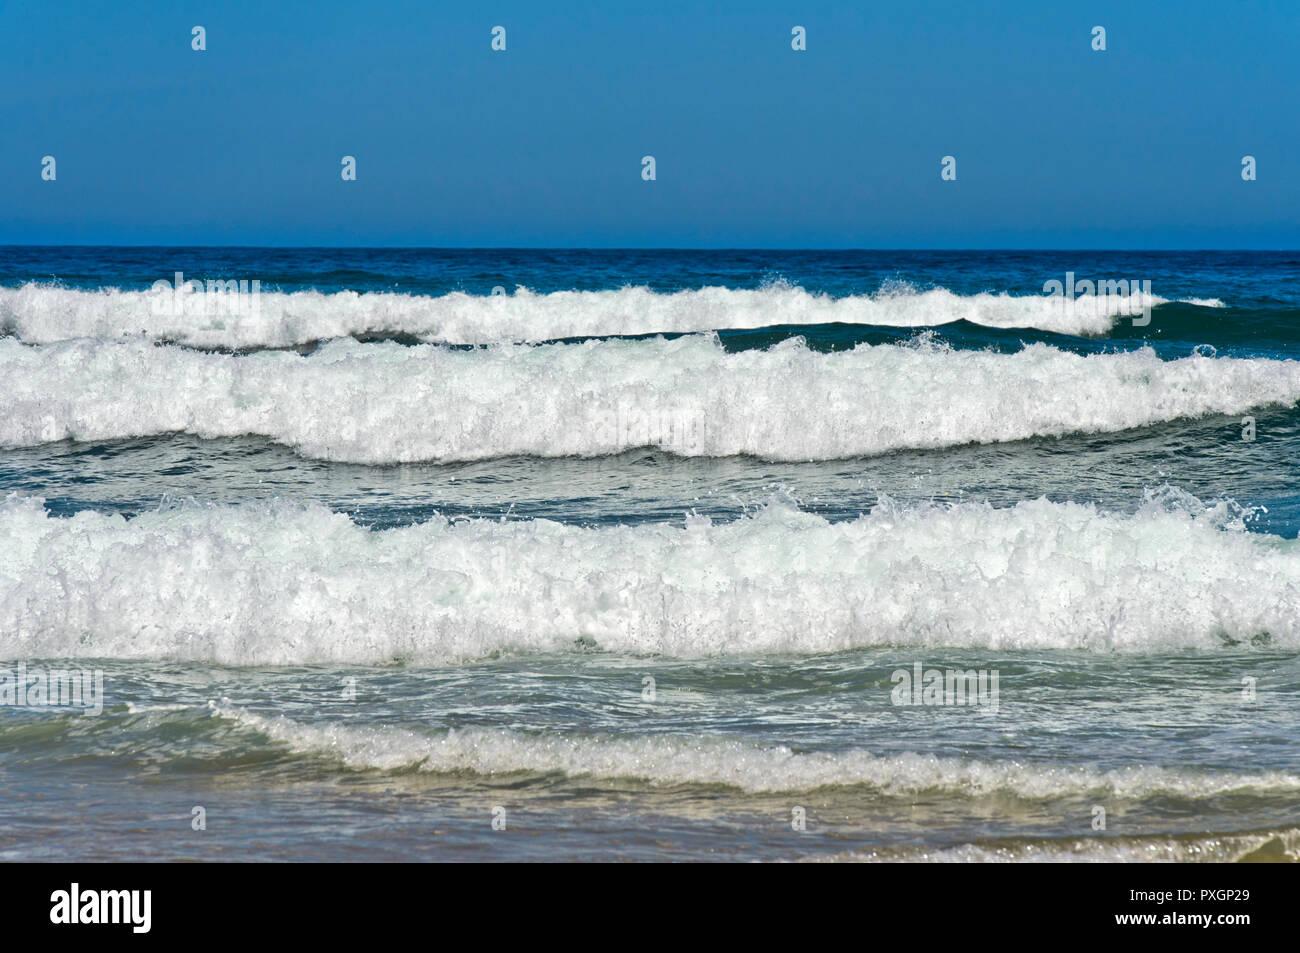 Breakers at the Costa Vicentina coast, Vila do Bispo, Portugal - Stock Image